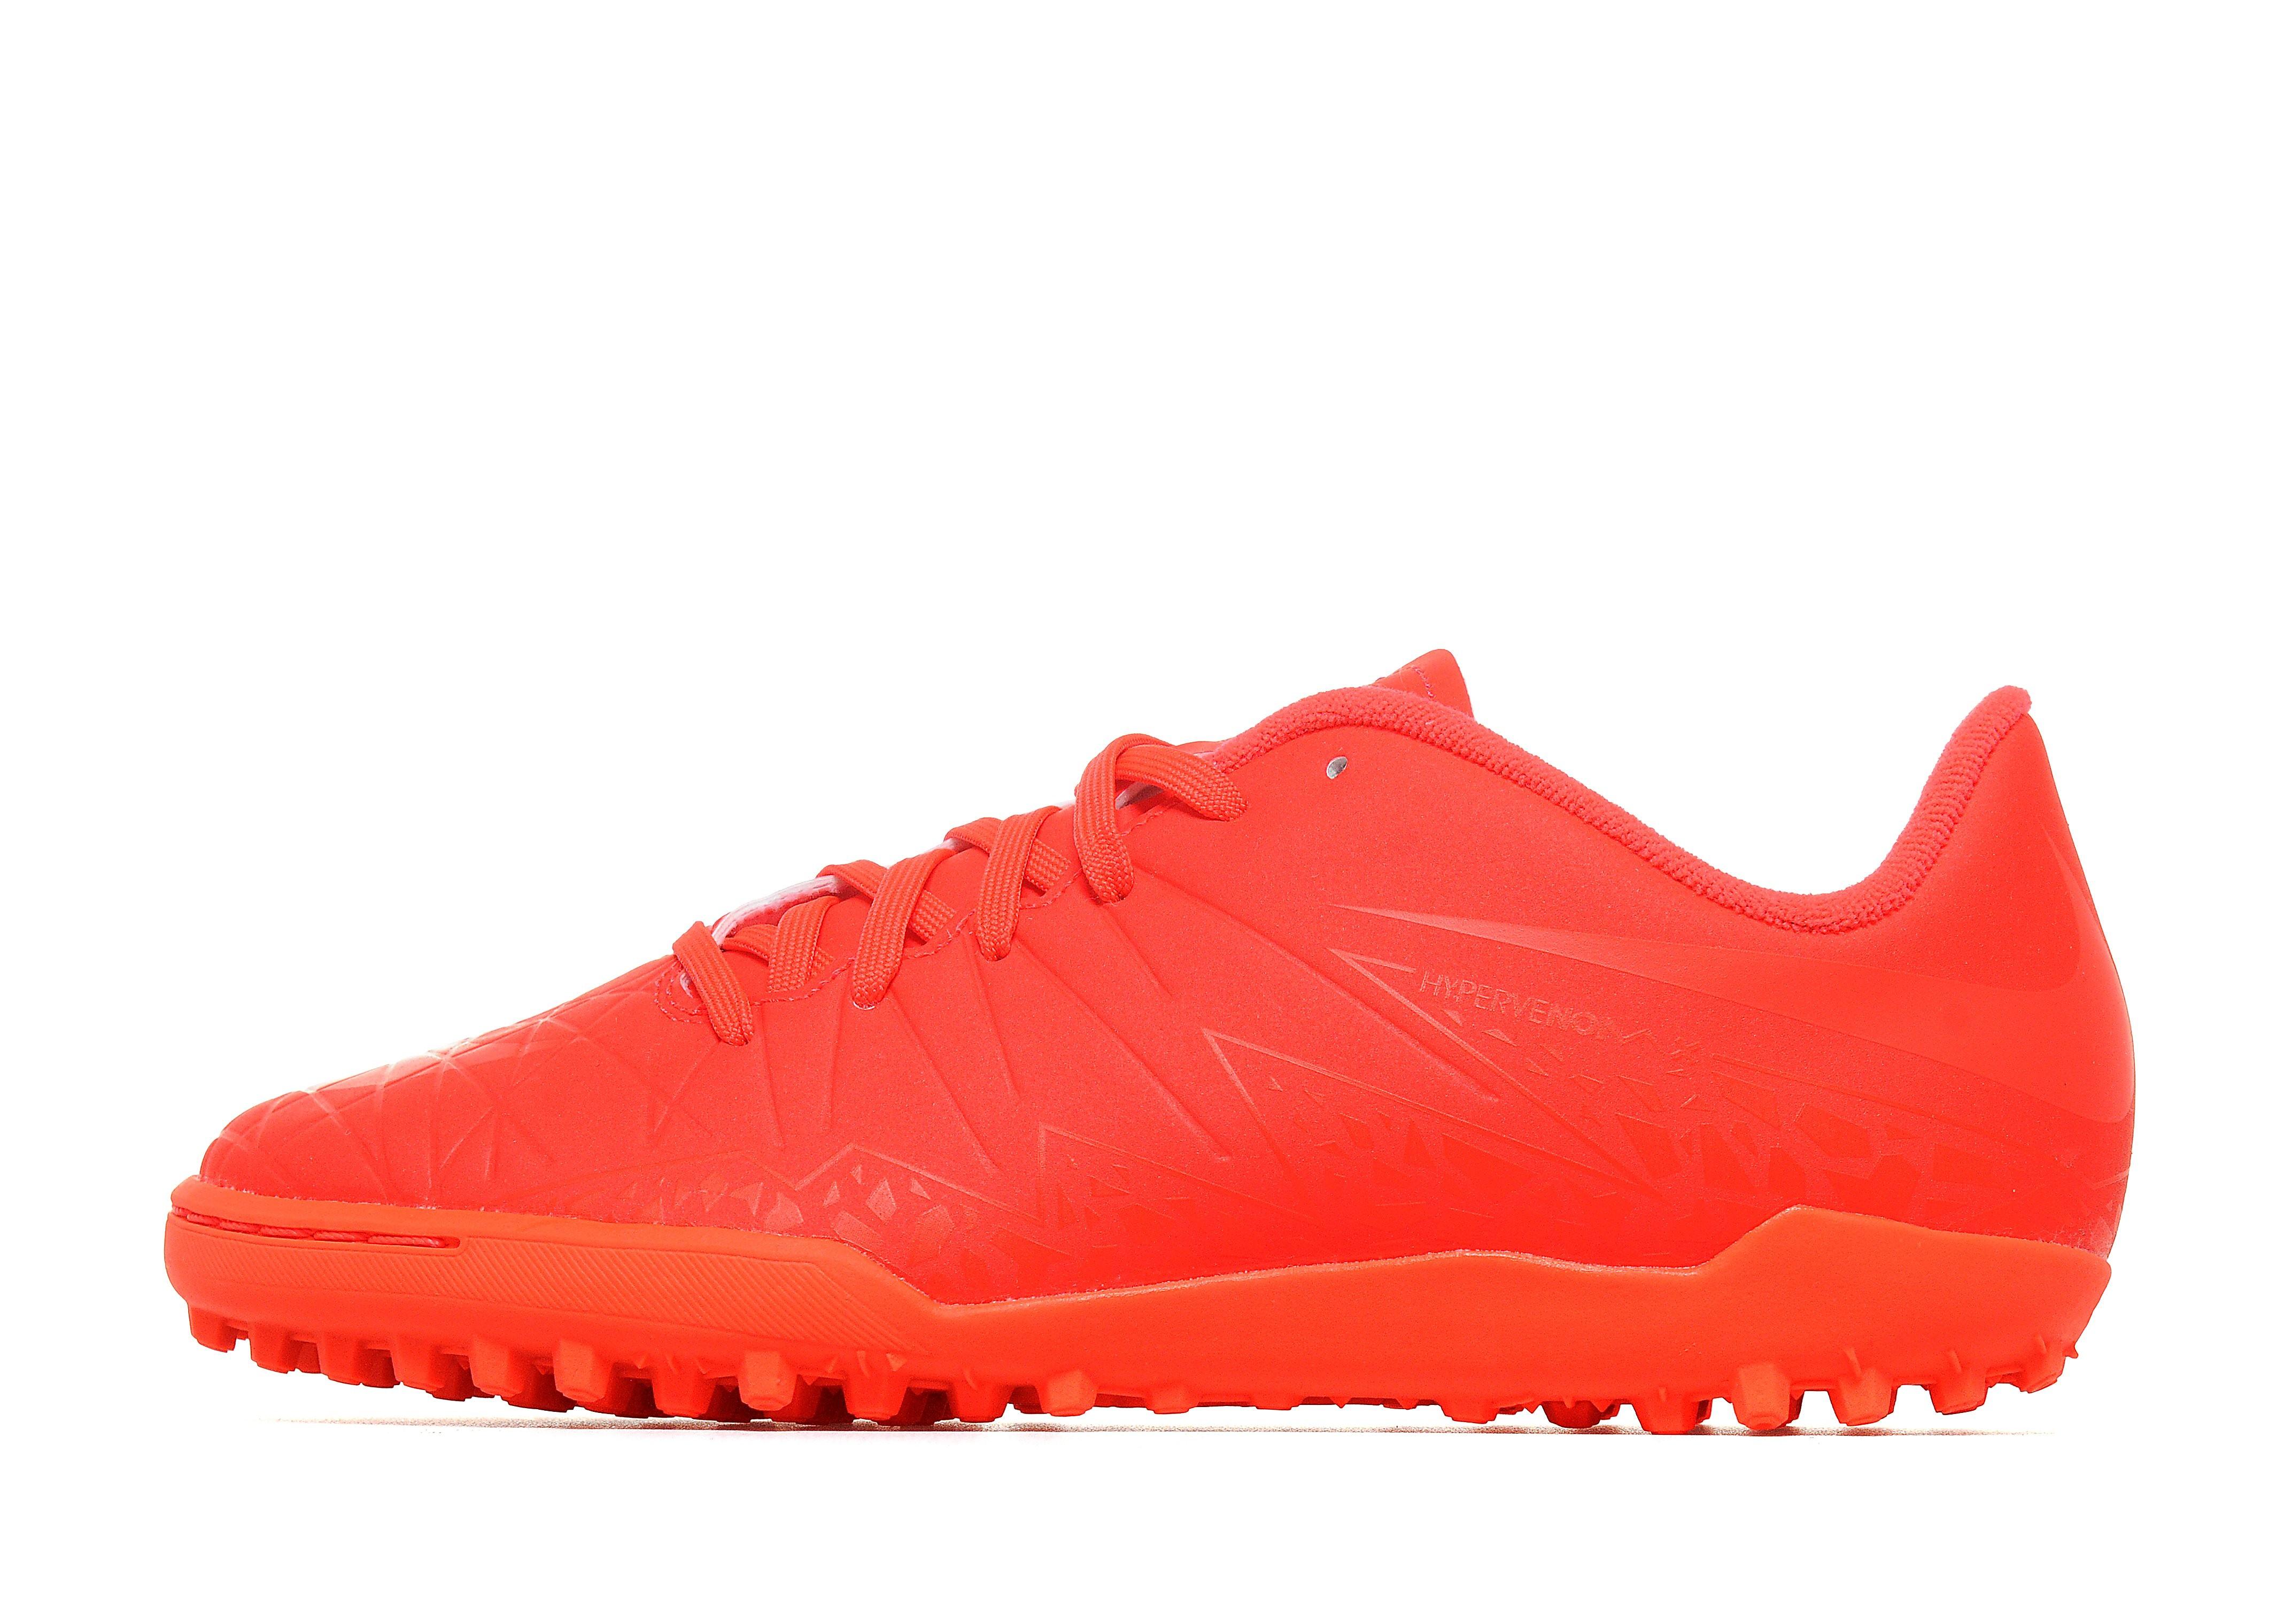 Nike Football X Glow Hypervenom Phelon II Turf Junior